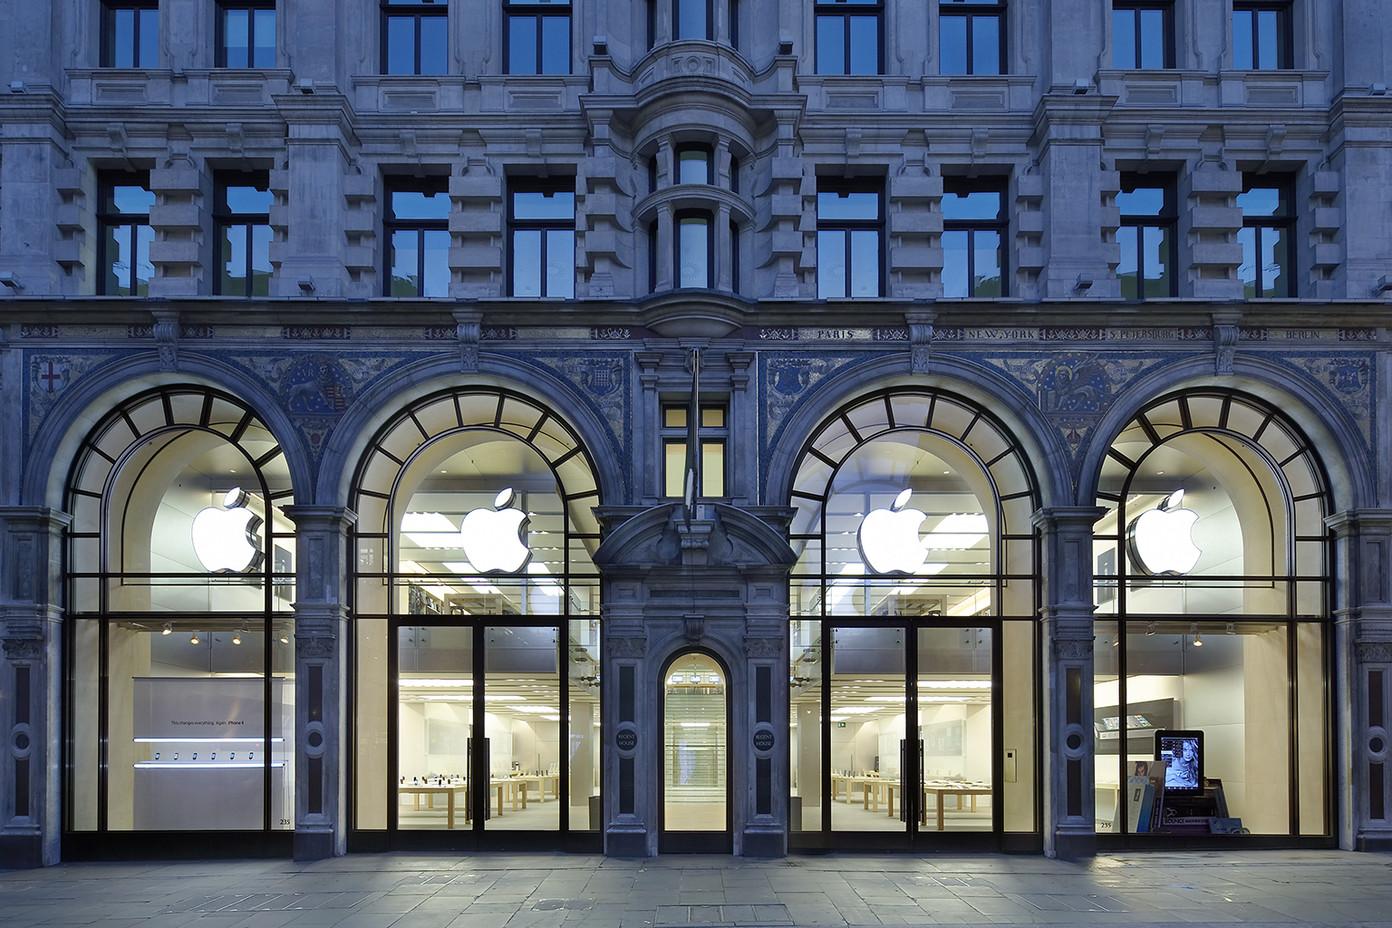 Apple Store - Regent Street